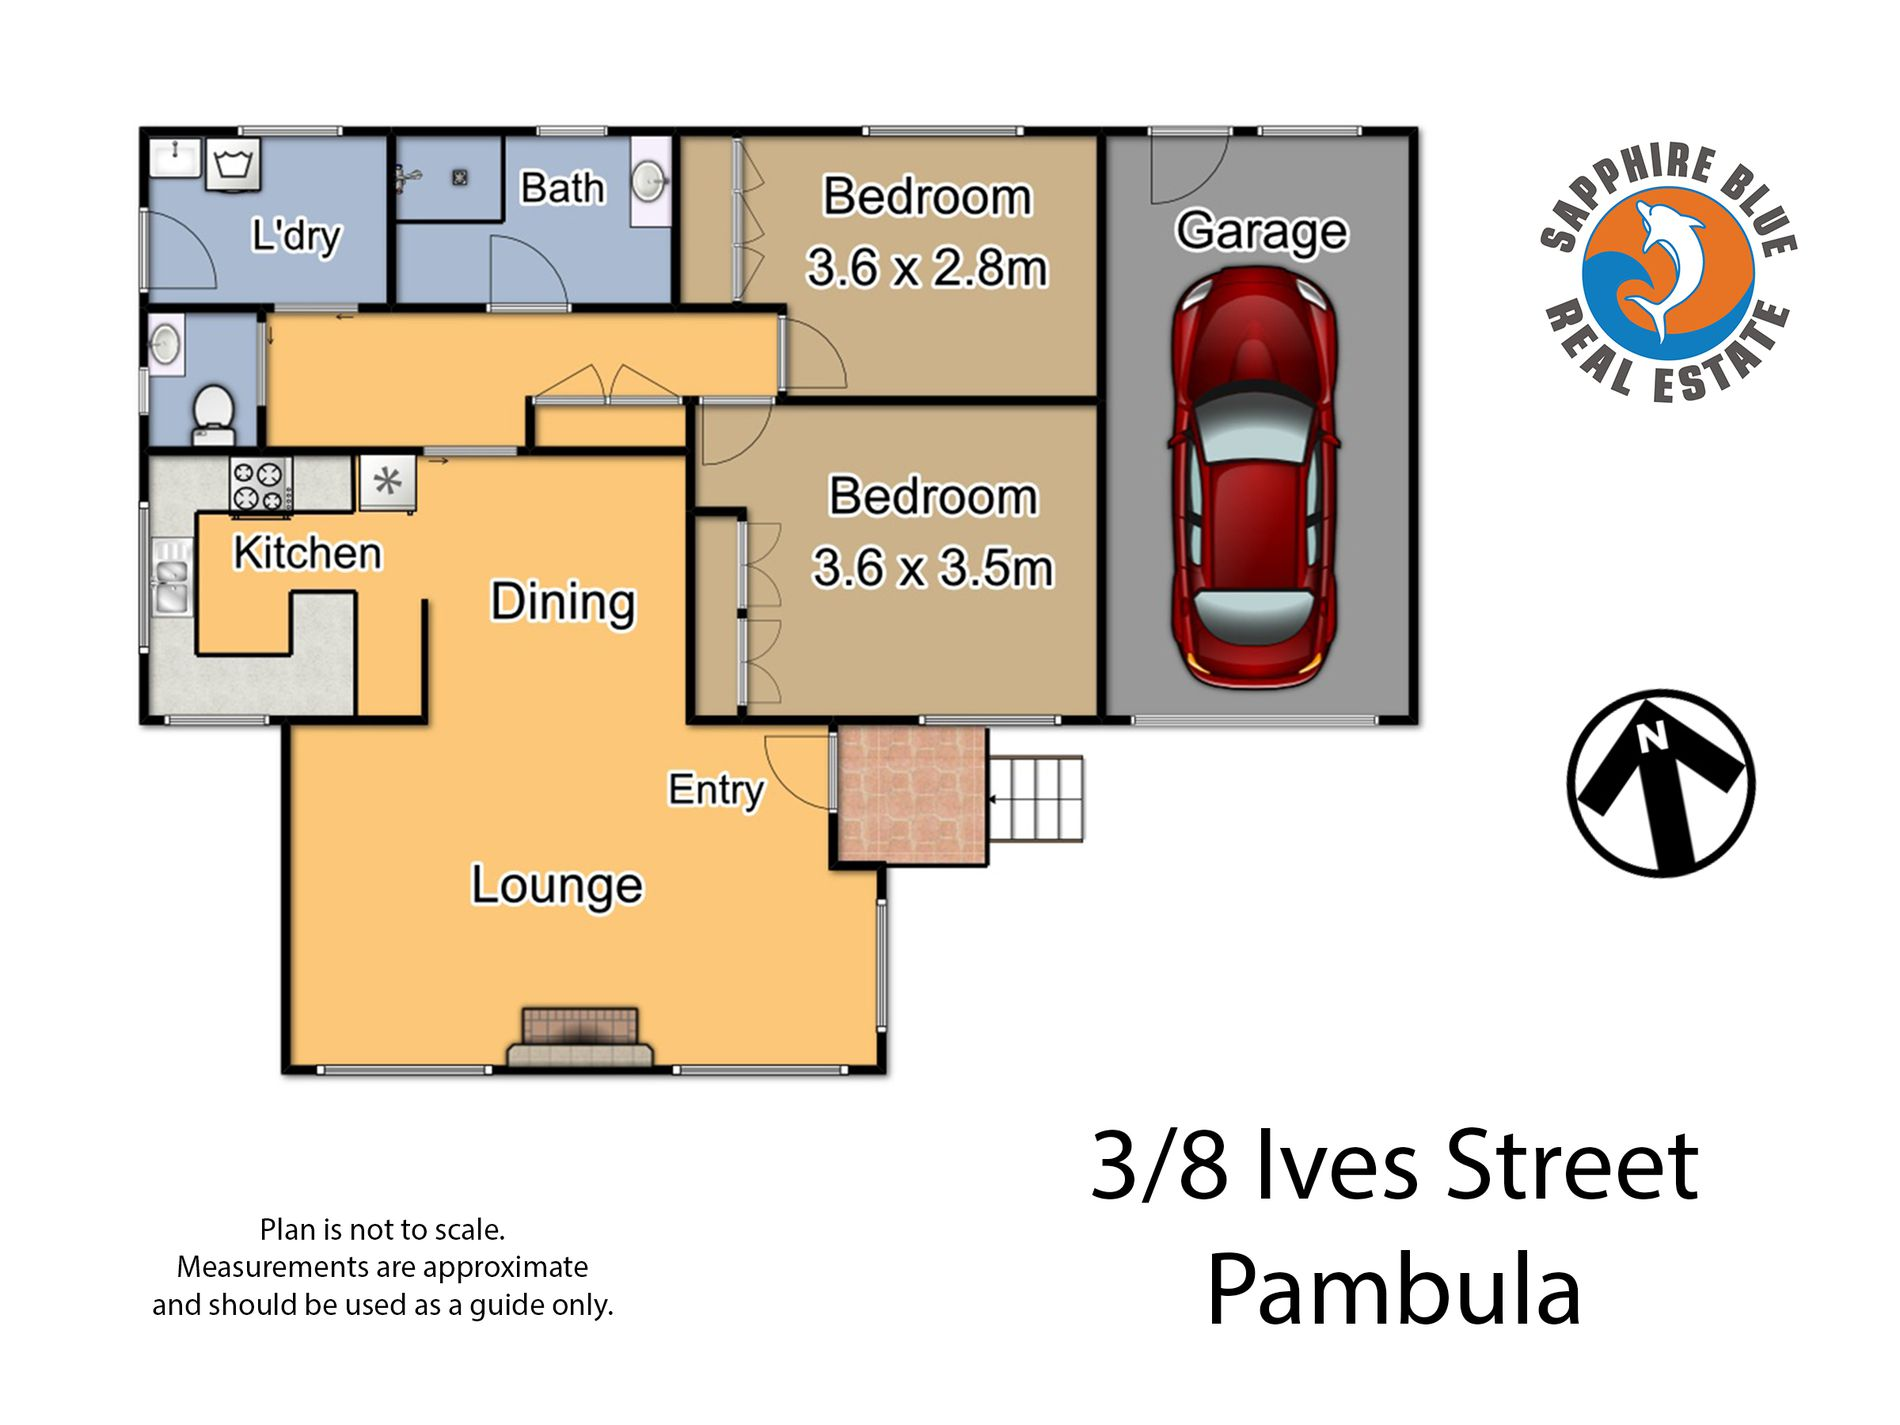 3 / 8 IVES STREET, Pambula